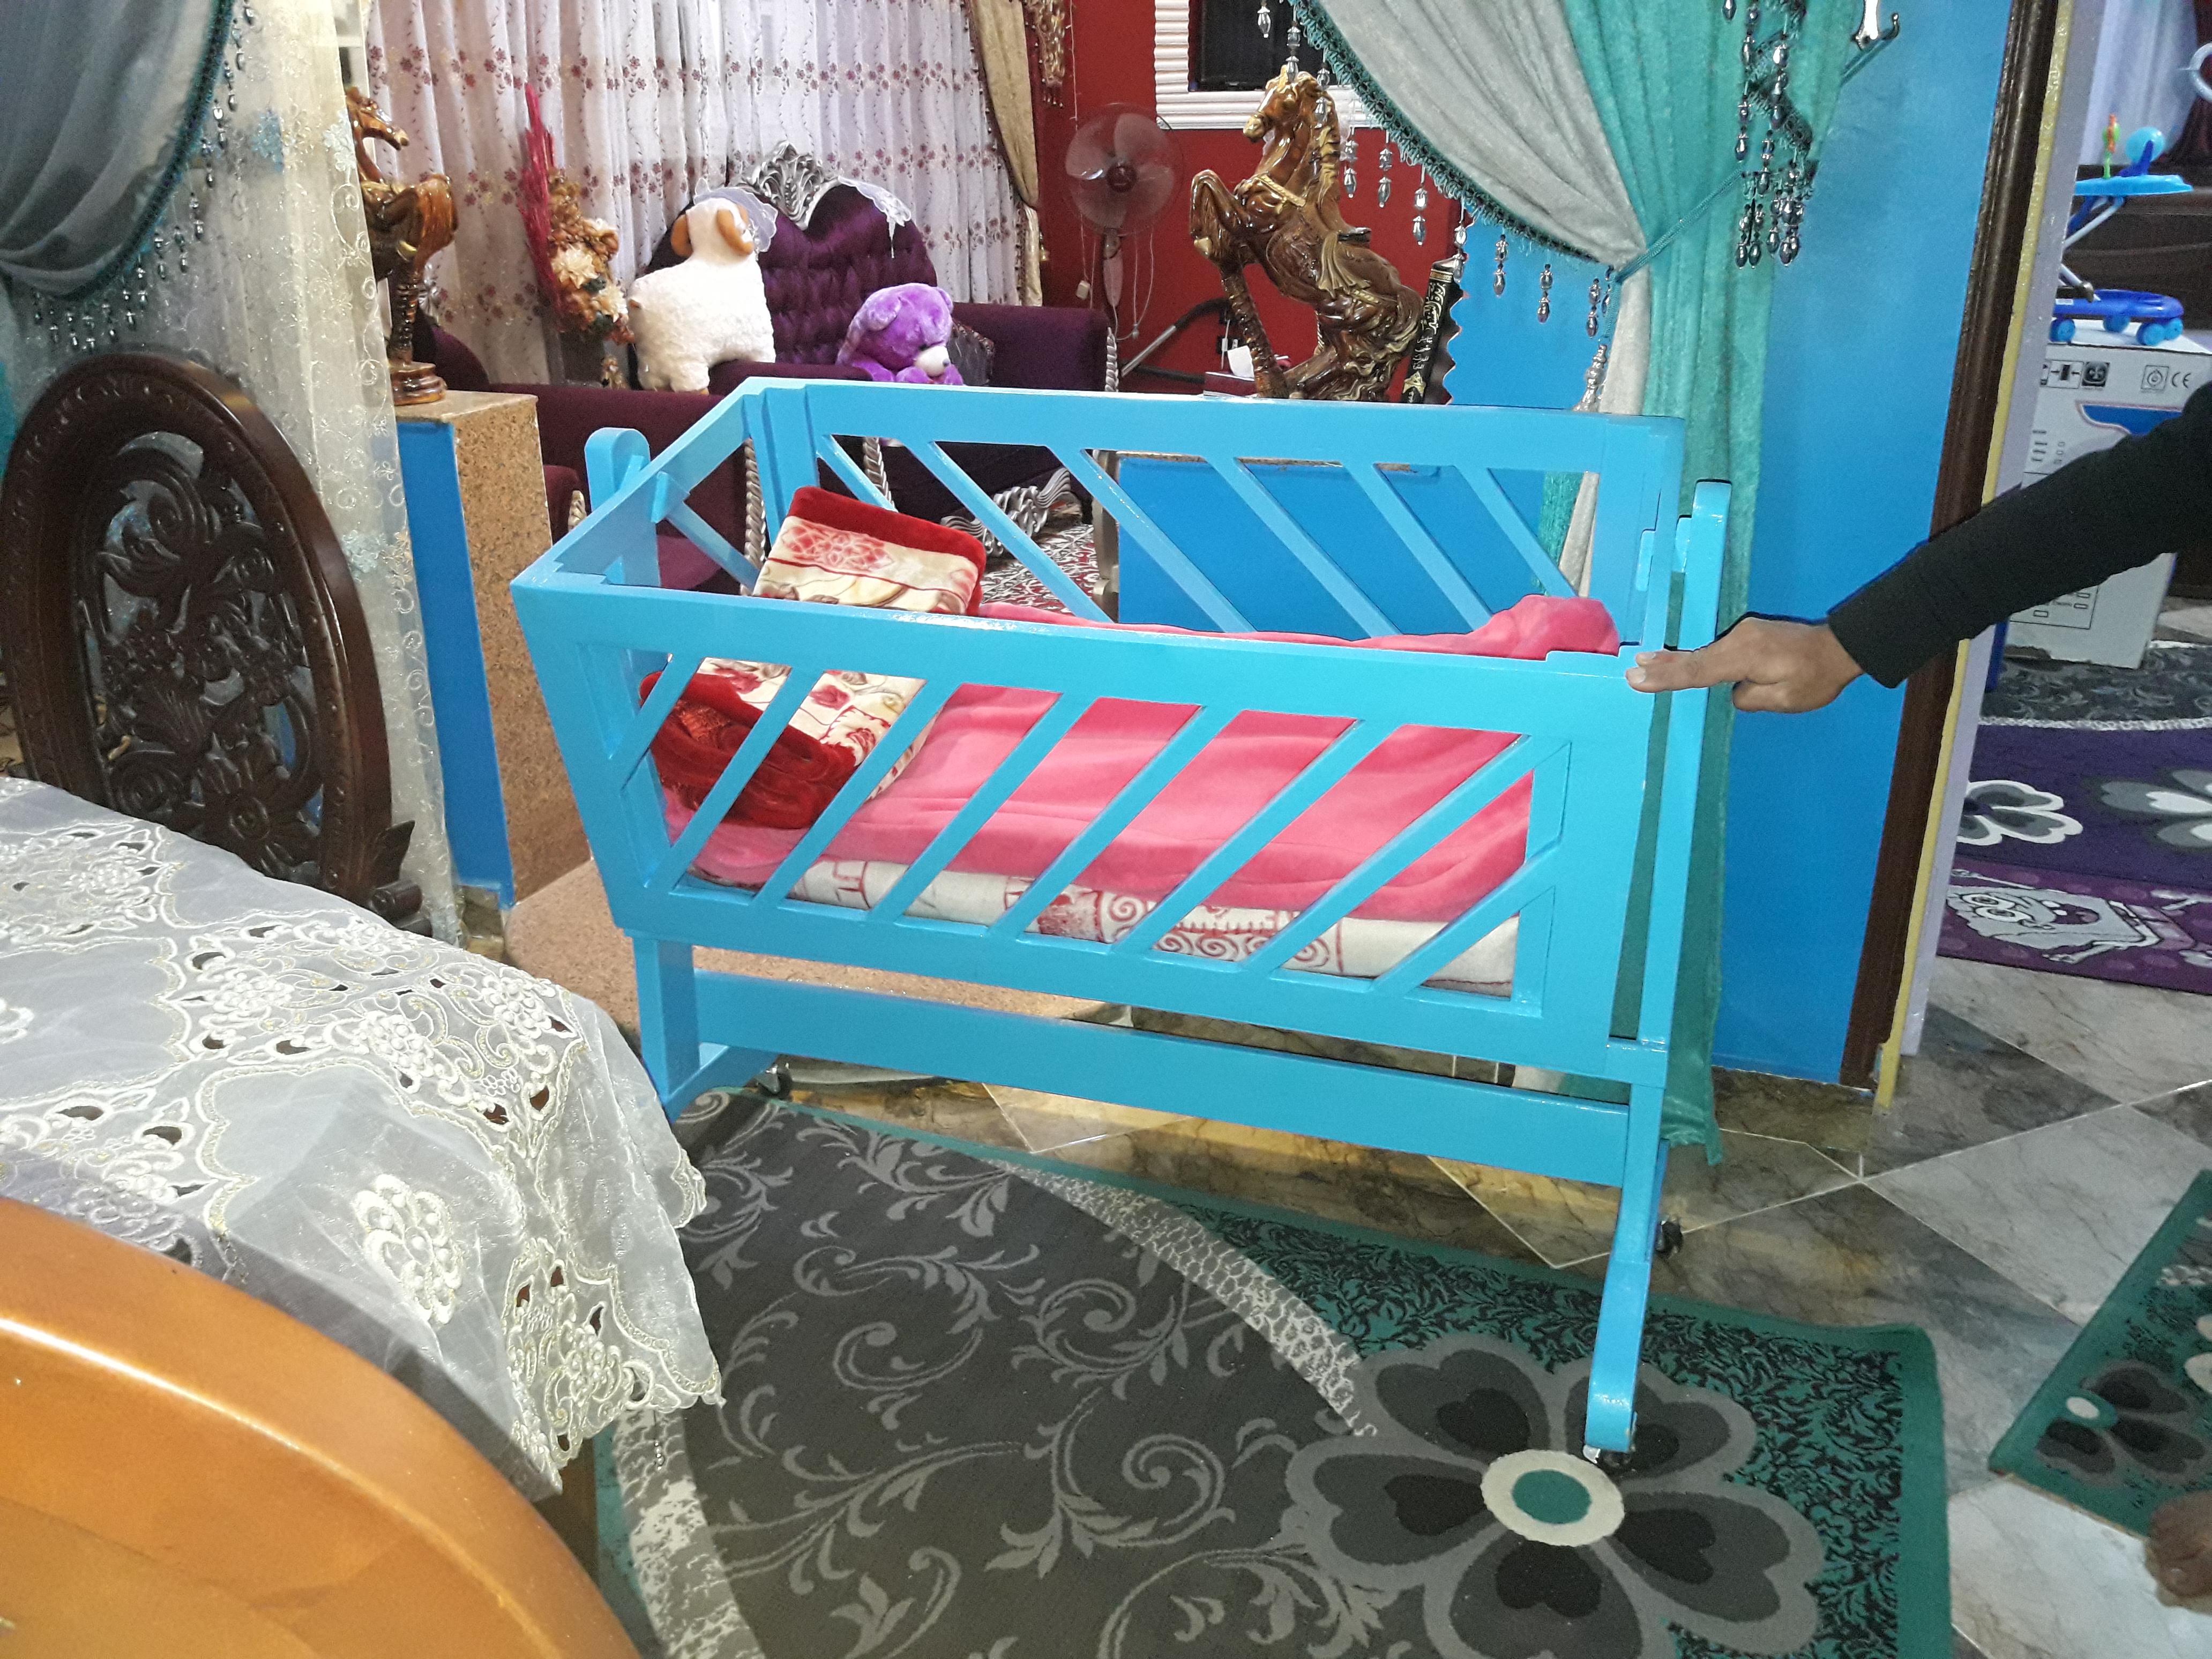 سرير اطفال هزاز...